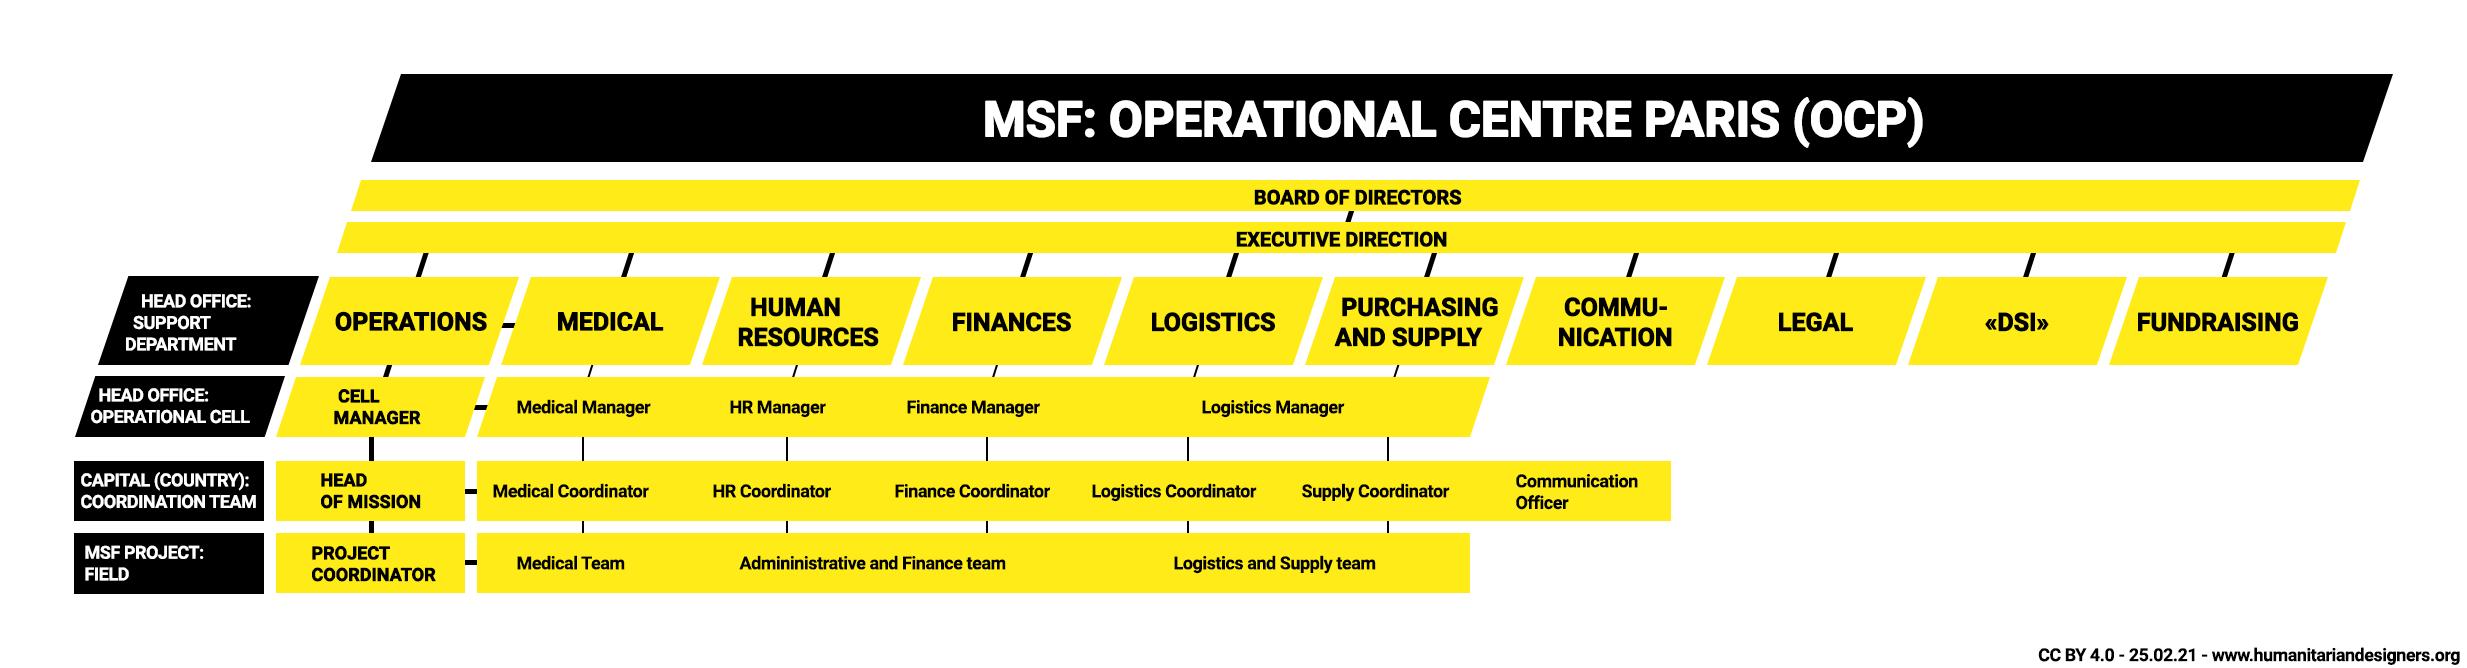 Medecins Sans Frontieres Operational Centre Paris Organisational chart MSF OCP